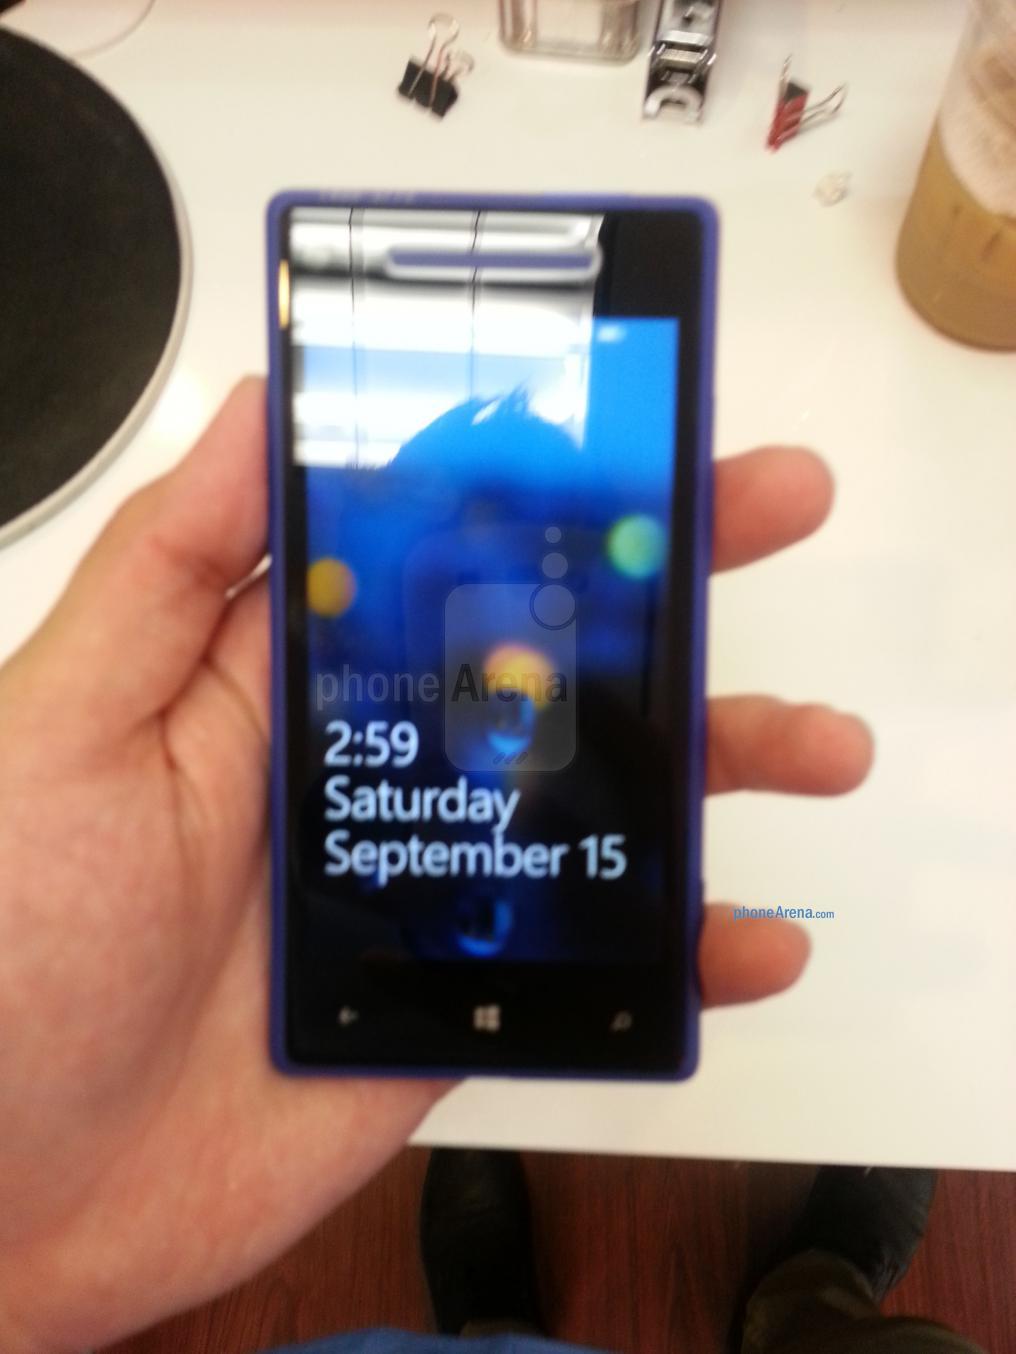 HTC Accord: Weiteres Bild zum Windows Phone 8 Smartphone durchgesickert-htc-accor-livebild-phonearena-com.jpg